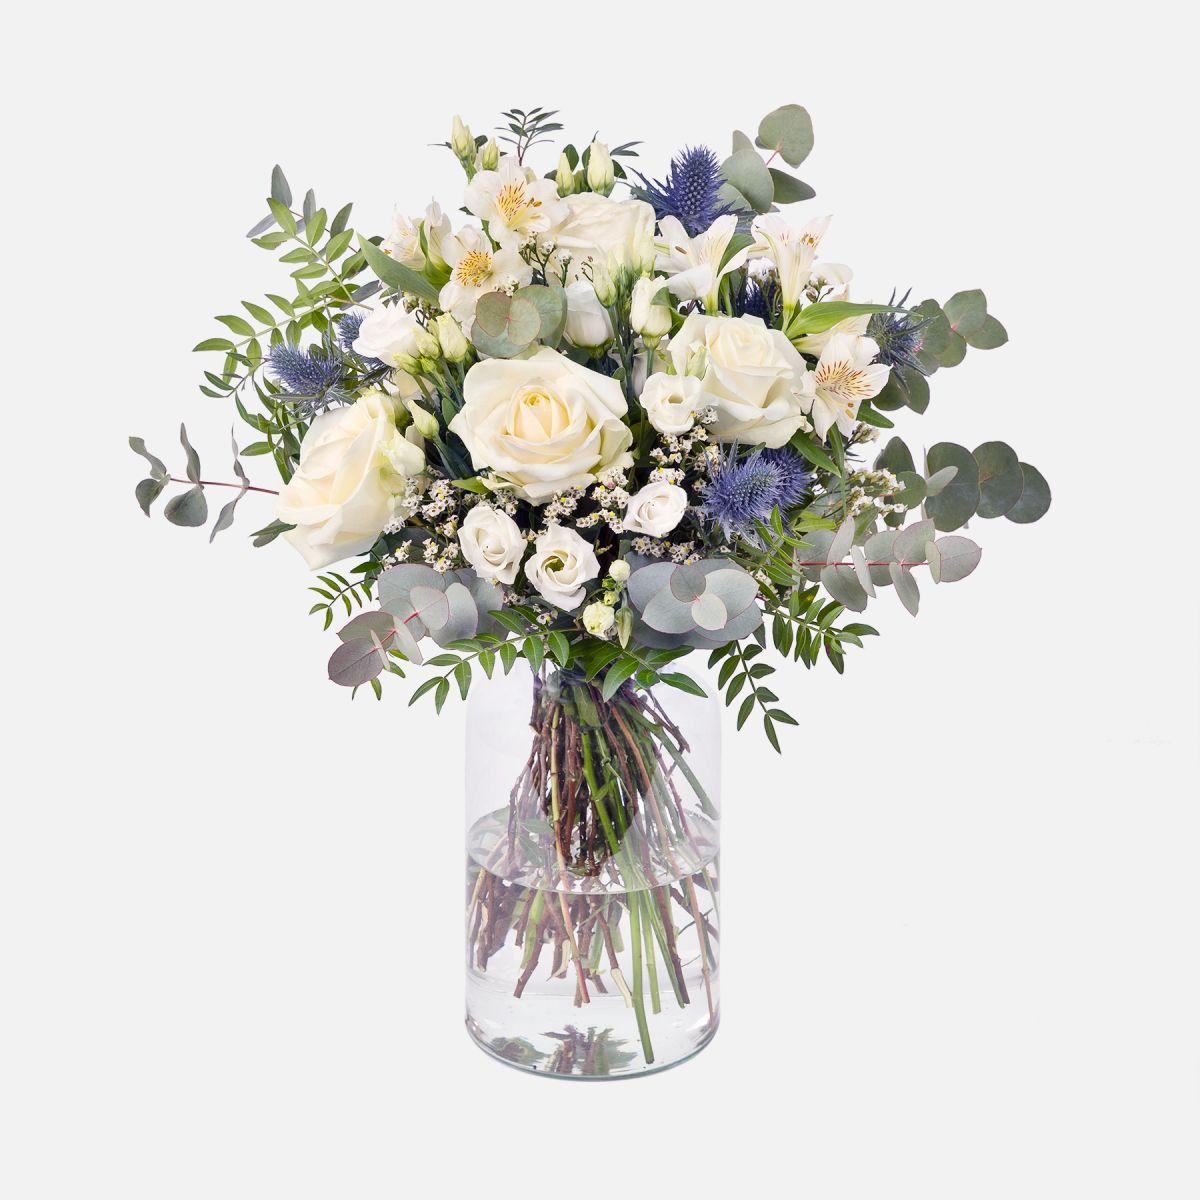 secar ramos de flores con rosas blancas